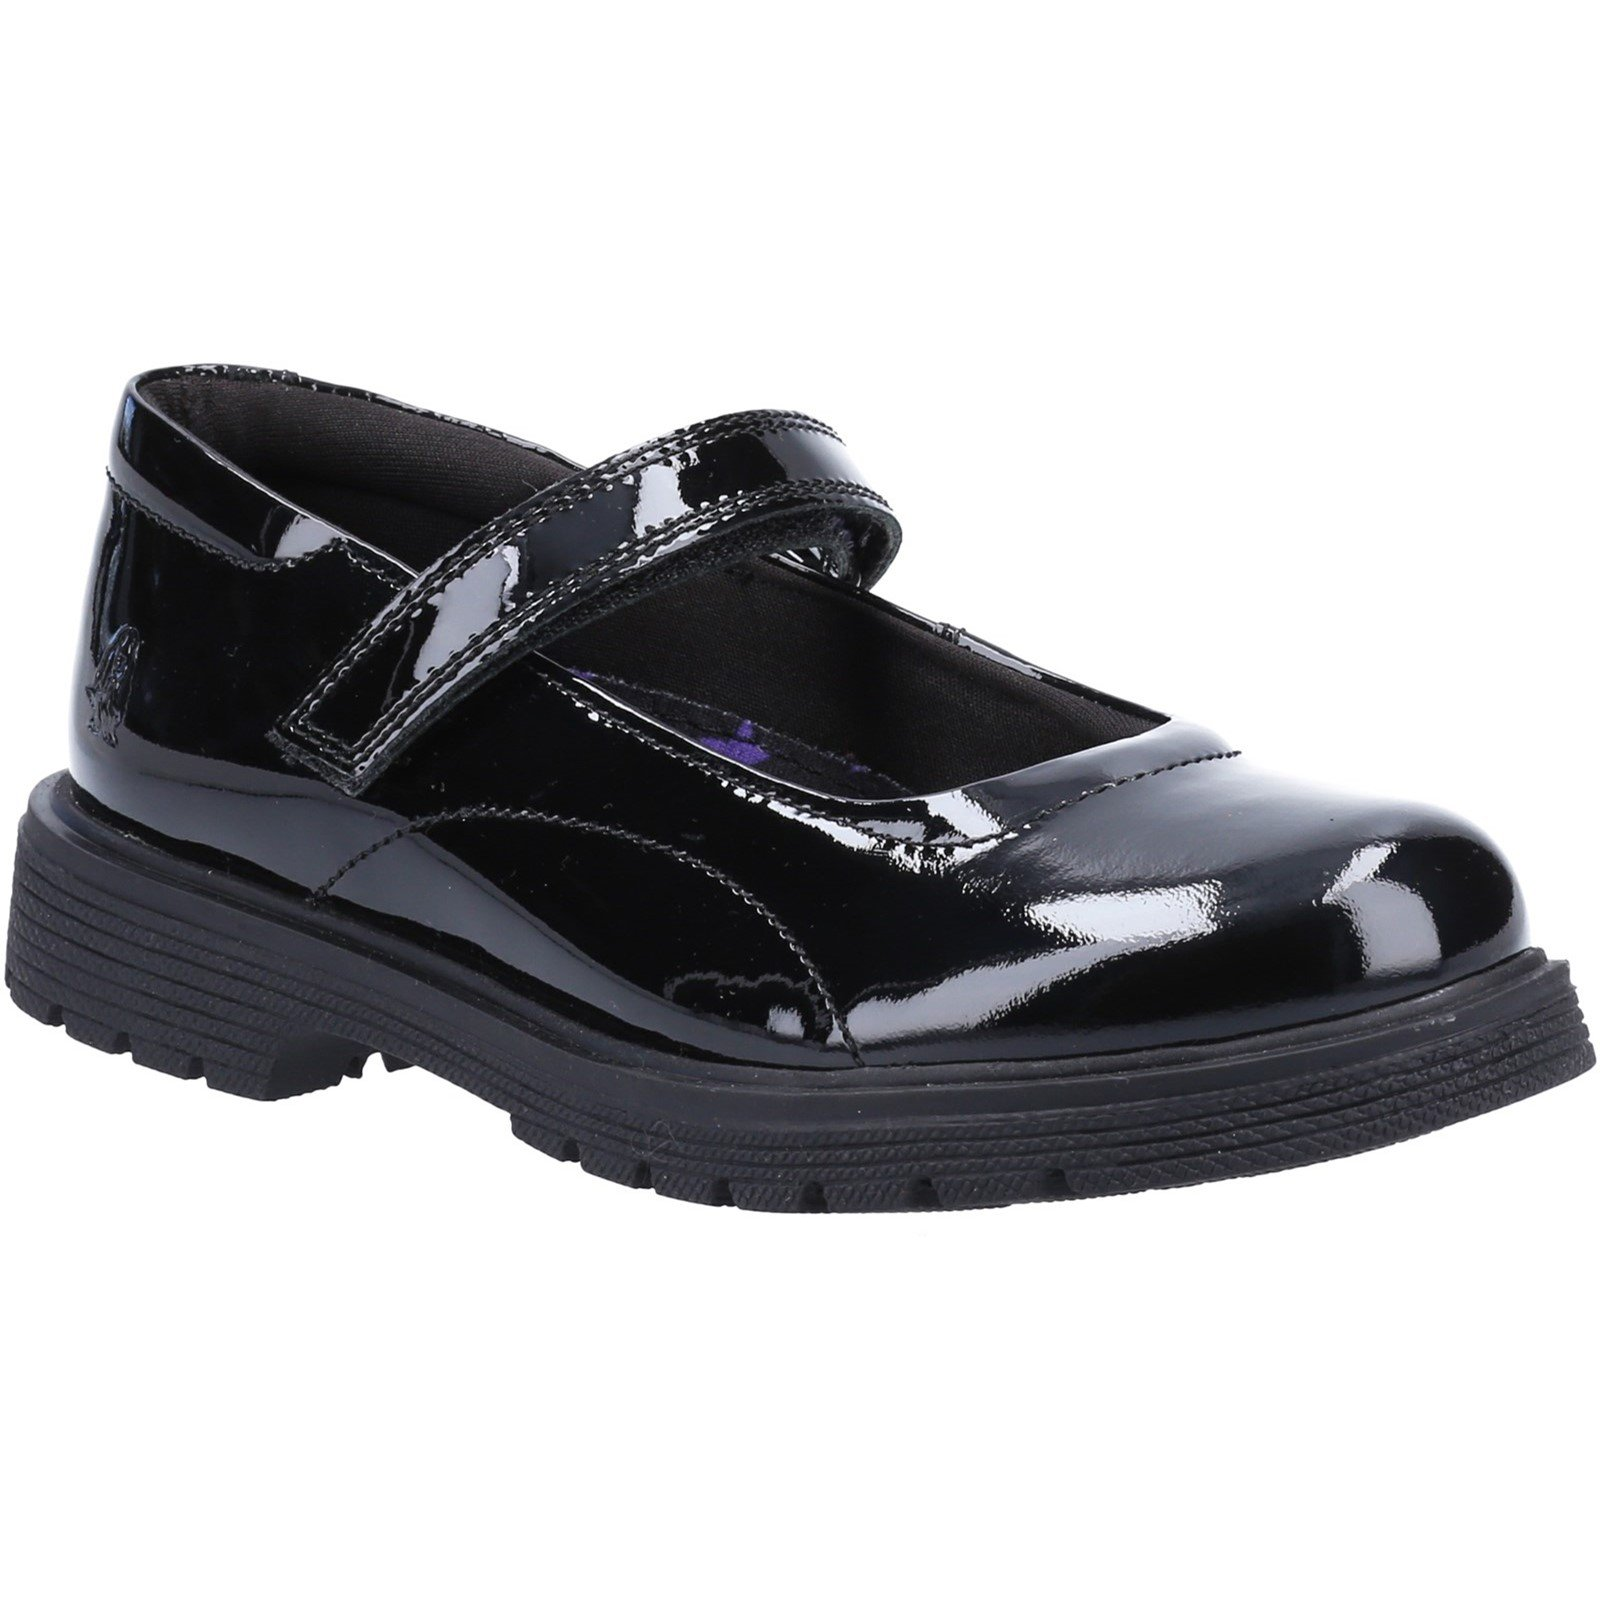 Hush Puppies Kid's Tally Senior School Flat Shoe Patent Black 32815 - Patent Black 4